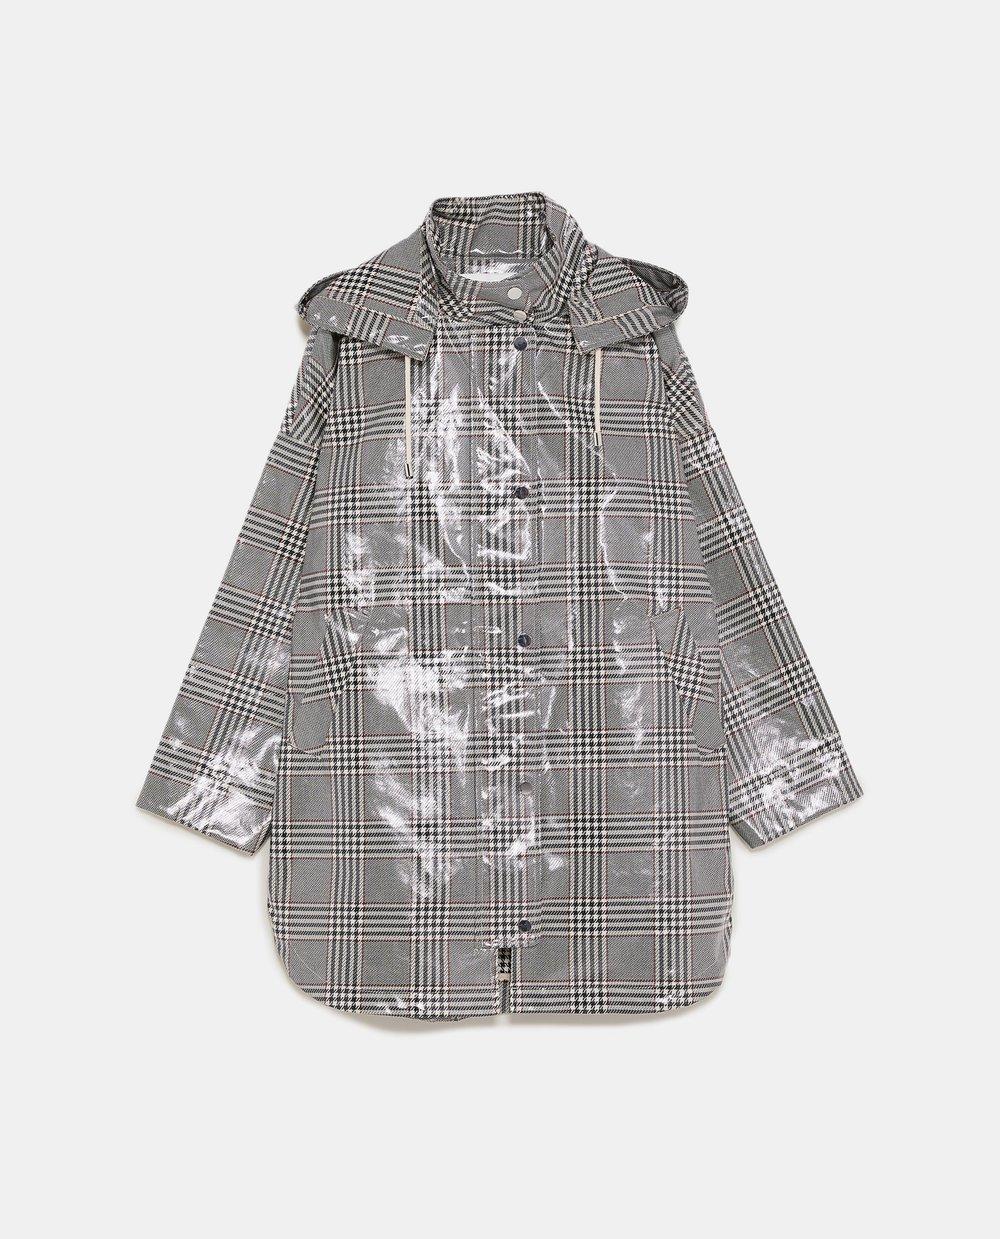 https://www.zara.com/ca/en/checked-waterproof-trench-coat-p00518064.html?v1=5922571&v2=719012